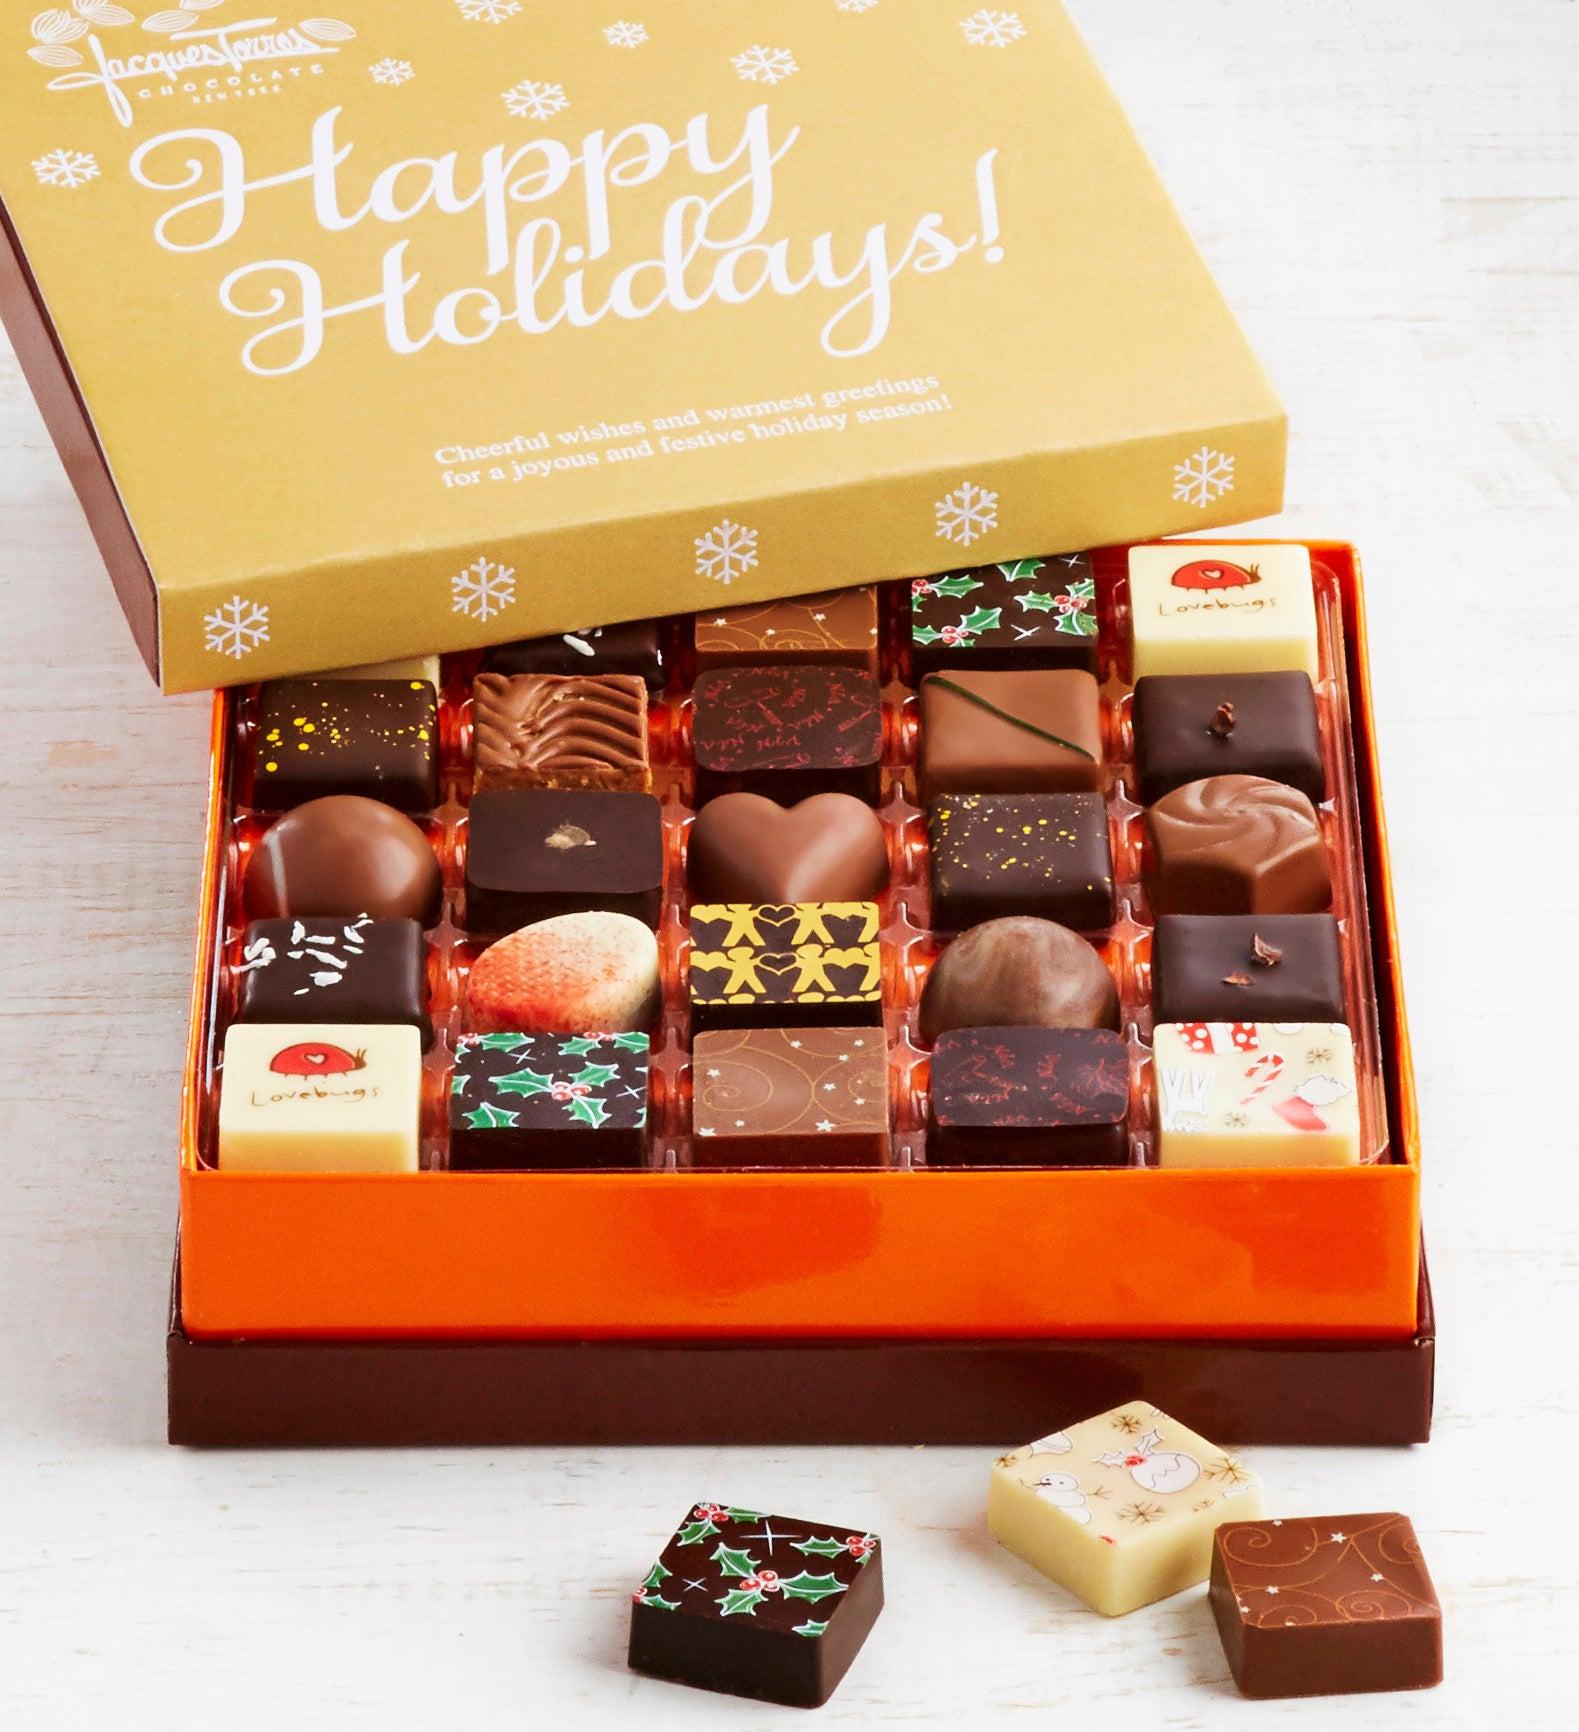 Jacques Torres Happy Holidays Chocolates Box pc